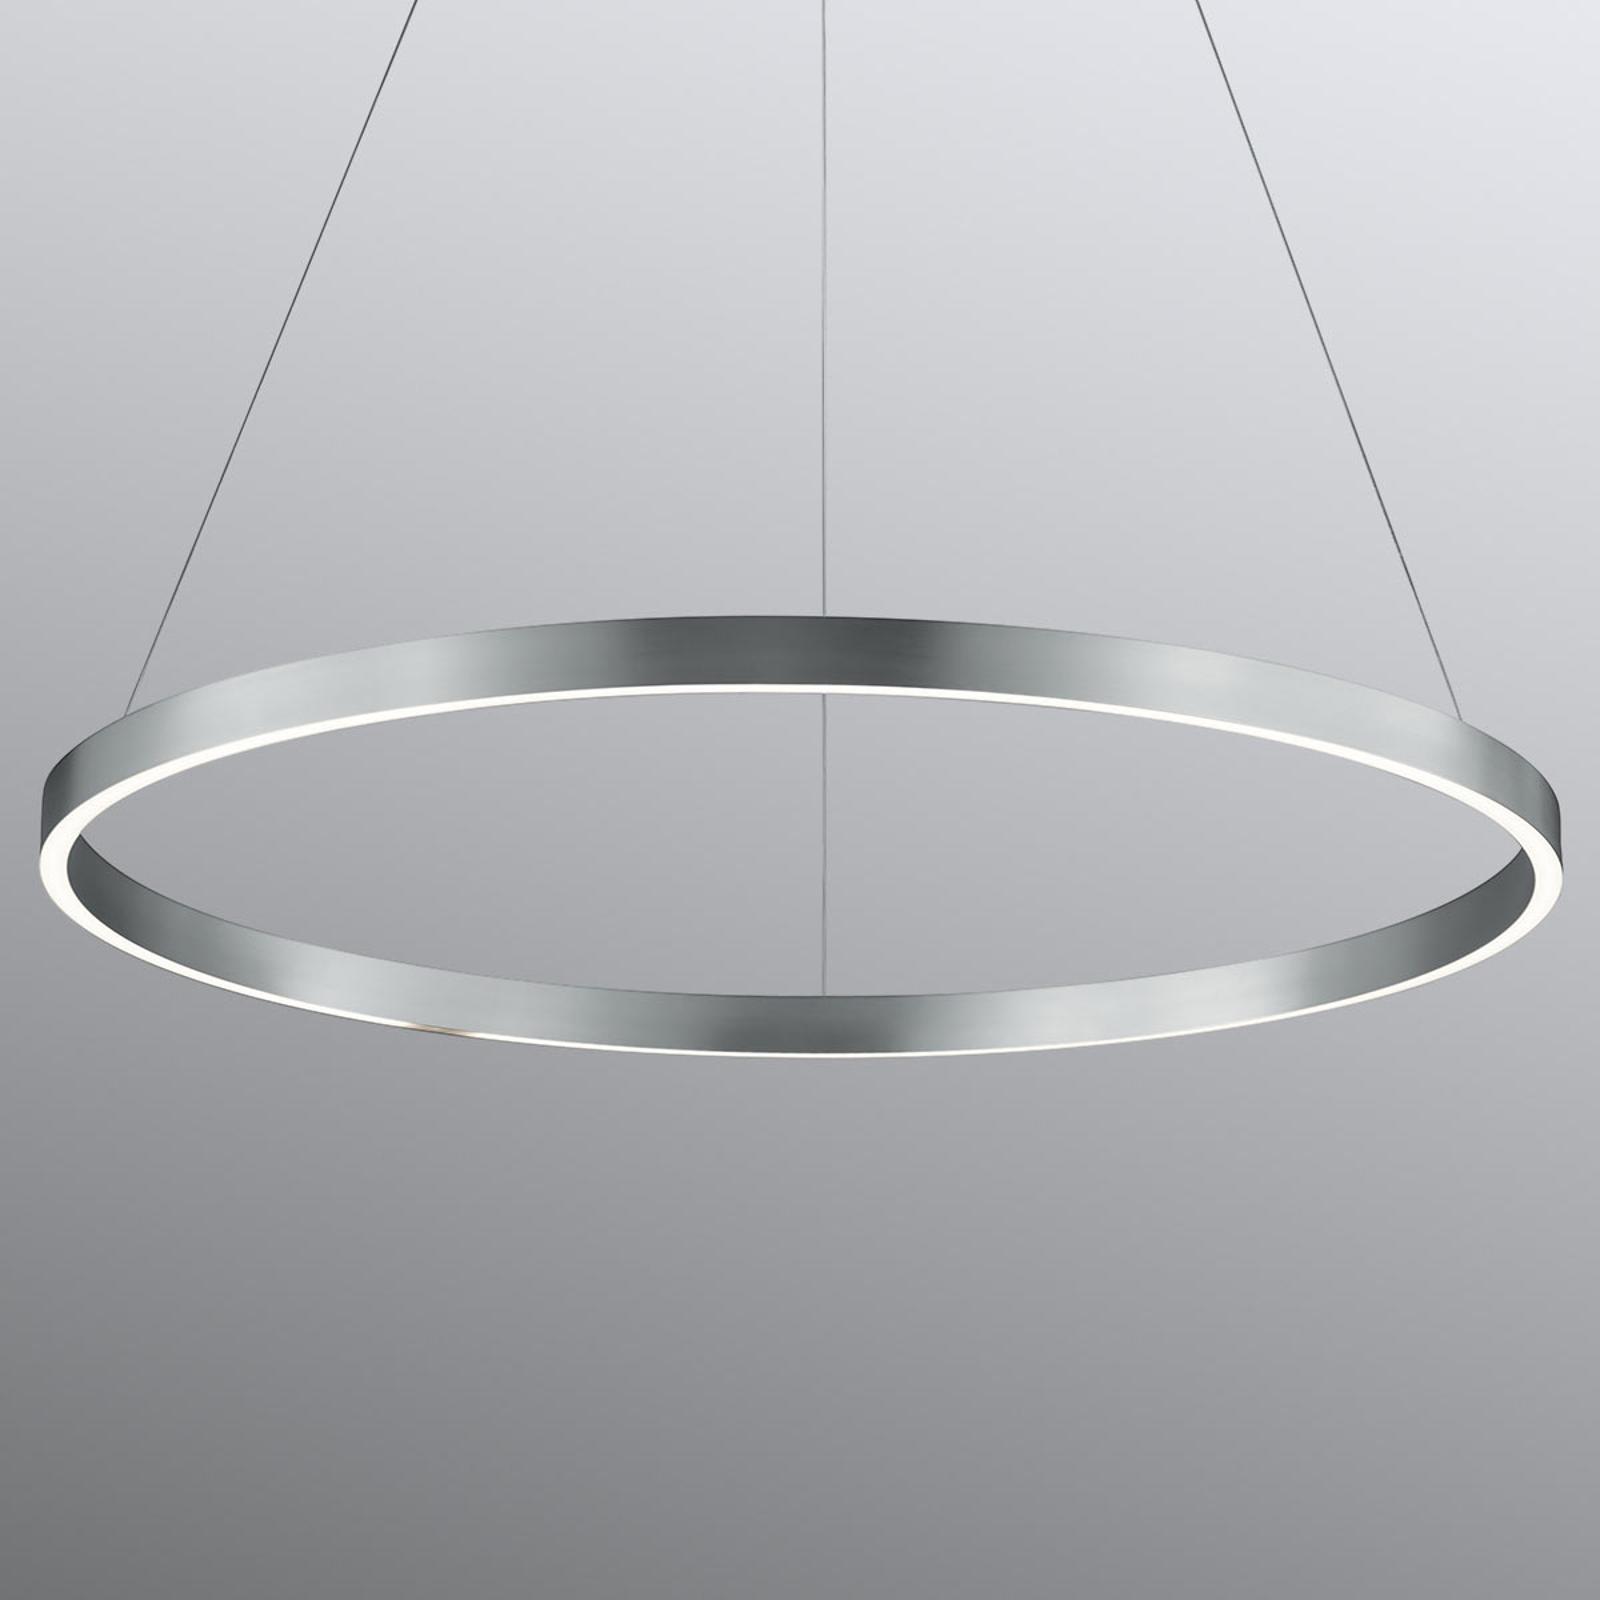 Circle – lampa wisząca LED, sterowana gestami